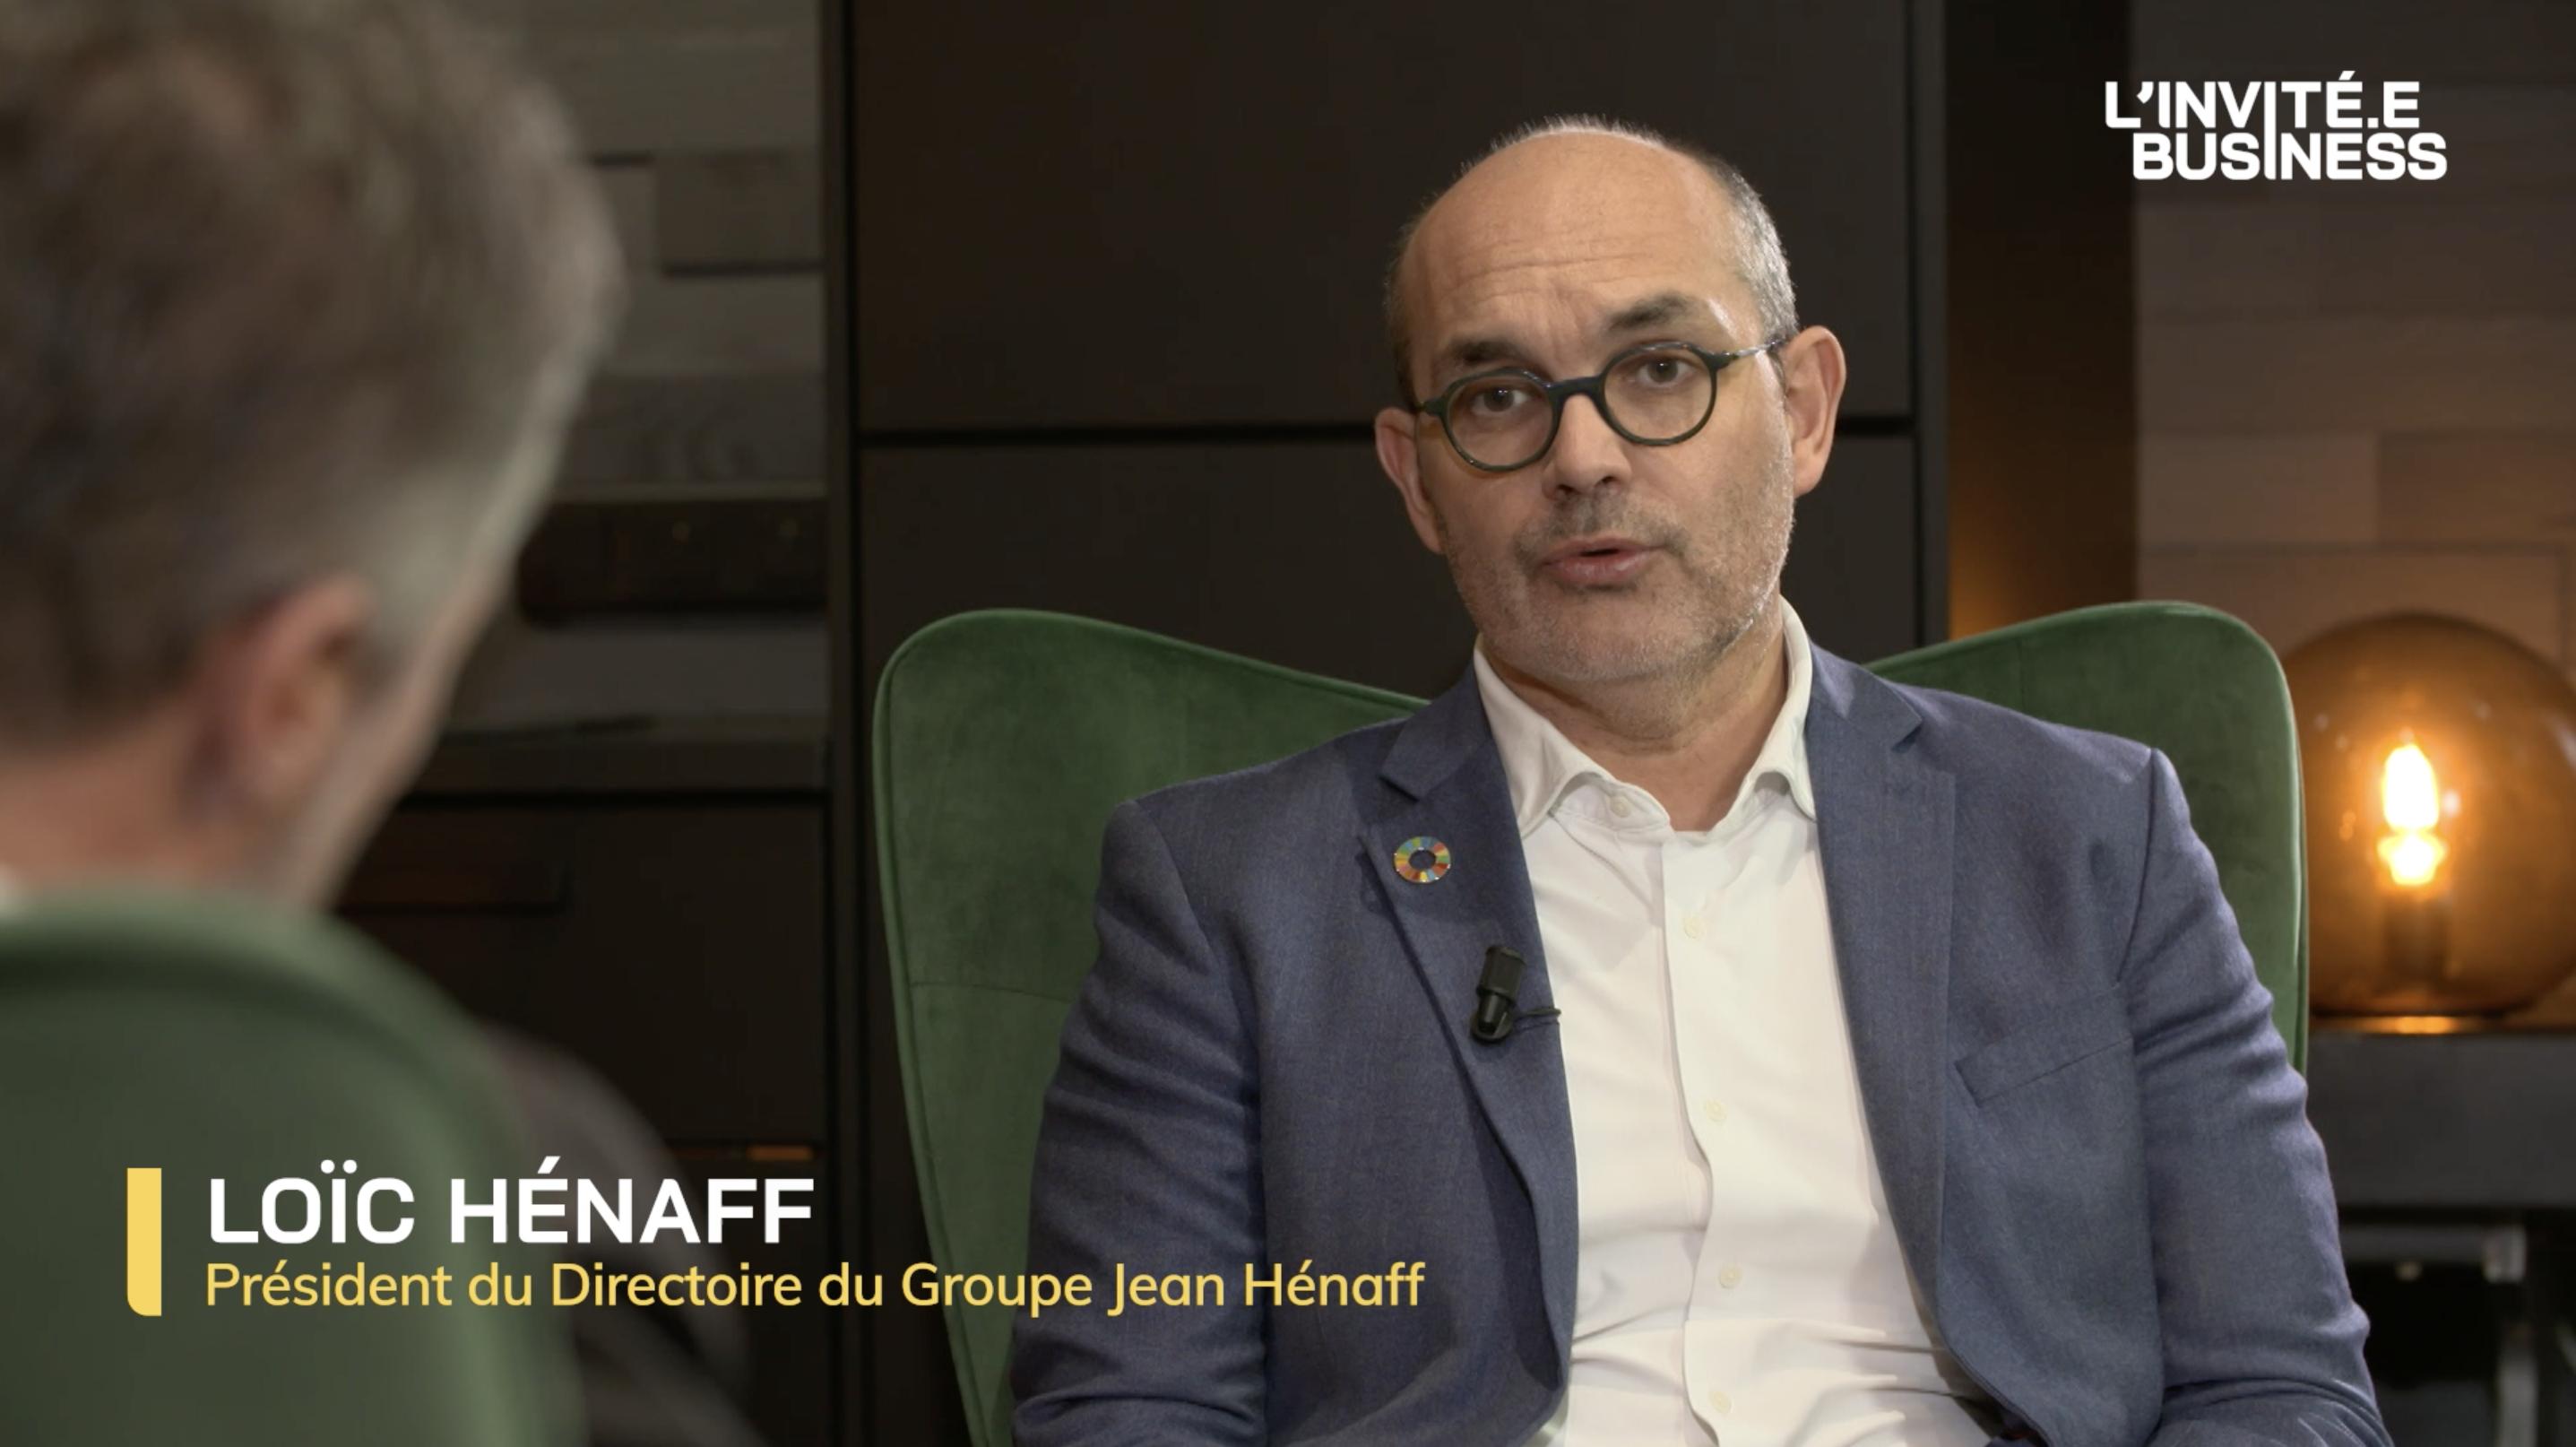 Loïc Hénaff, Président du Directoire du Groupe Hénaff